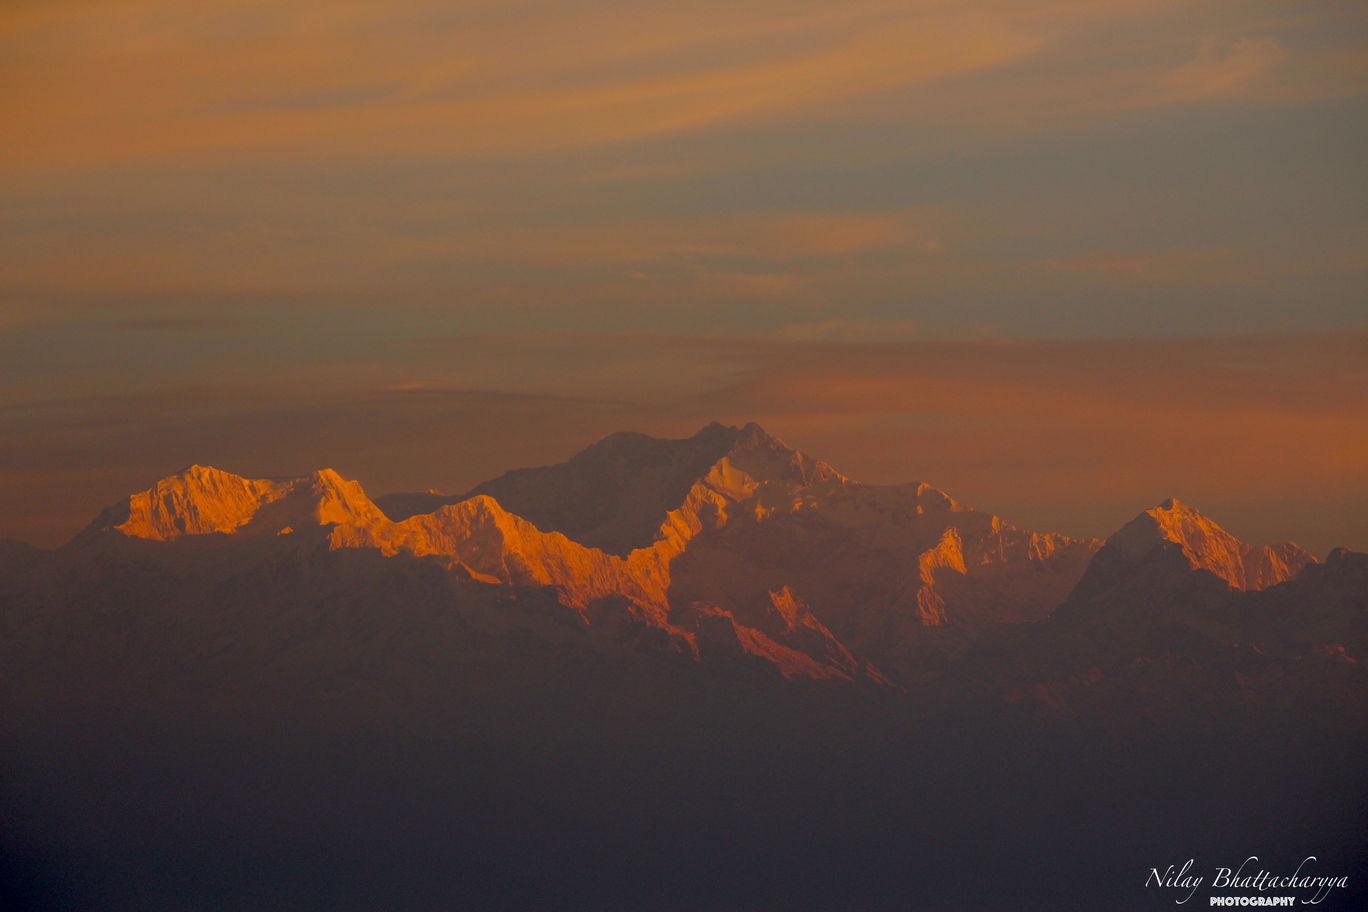 Photo of Darjeeling By Nilay Bhattacharyya